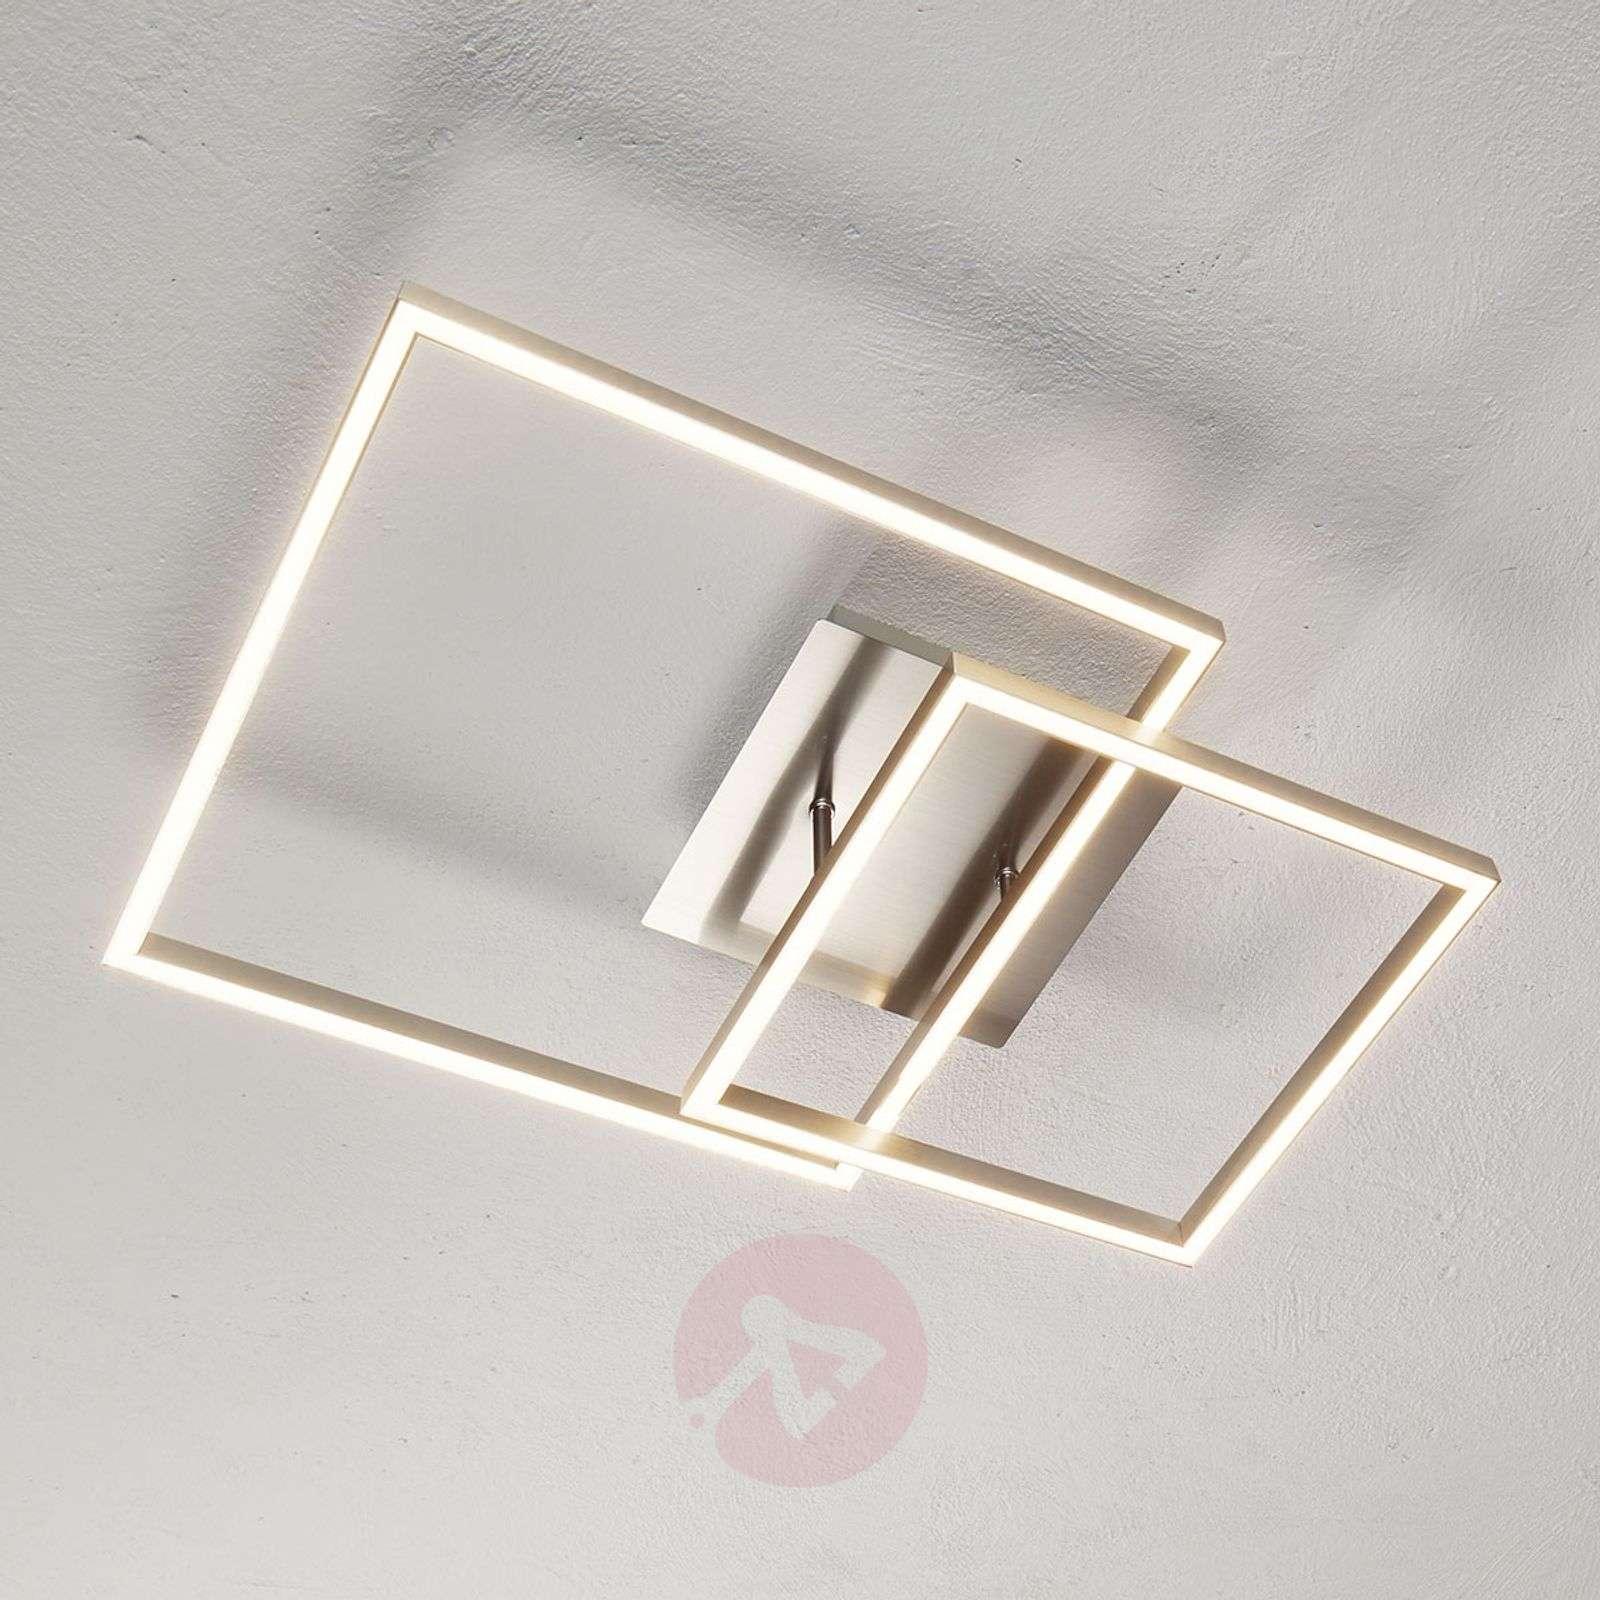 Moderni LED-kattovalaisin Delian-9987049-04